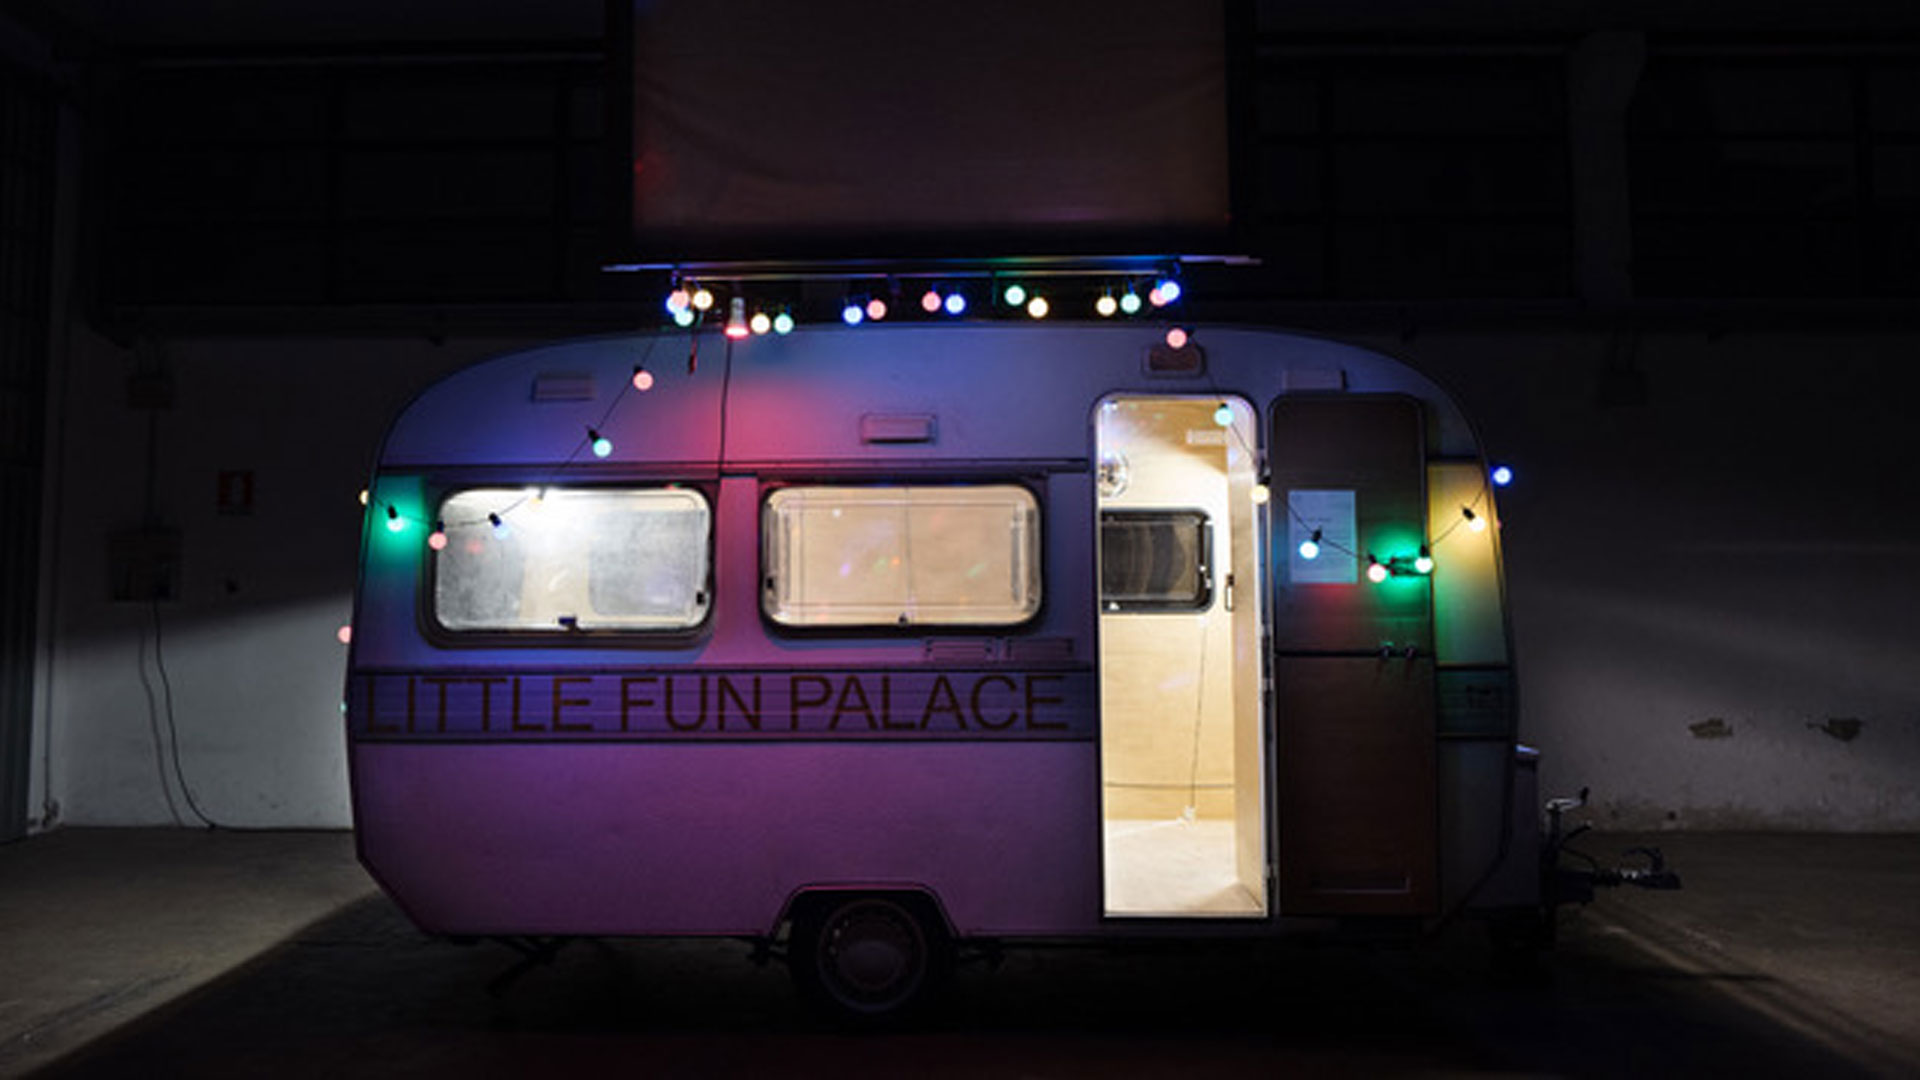 Little Fun Palace